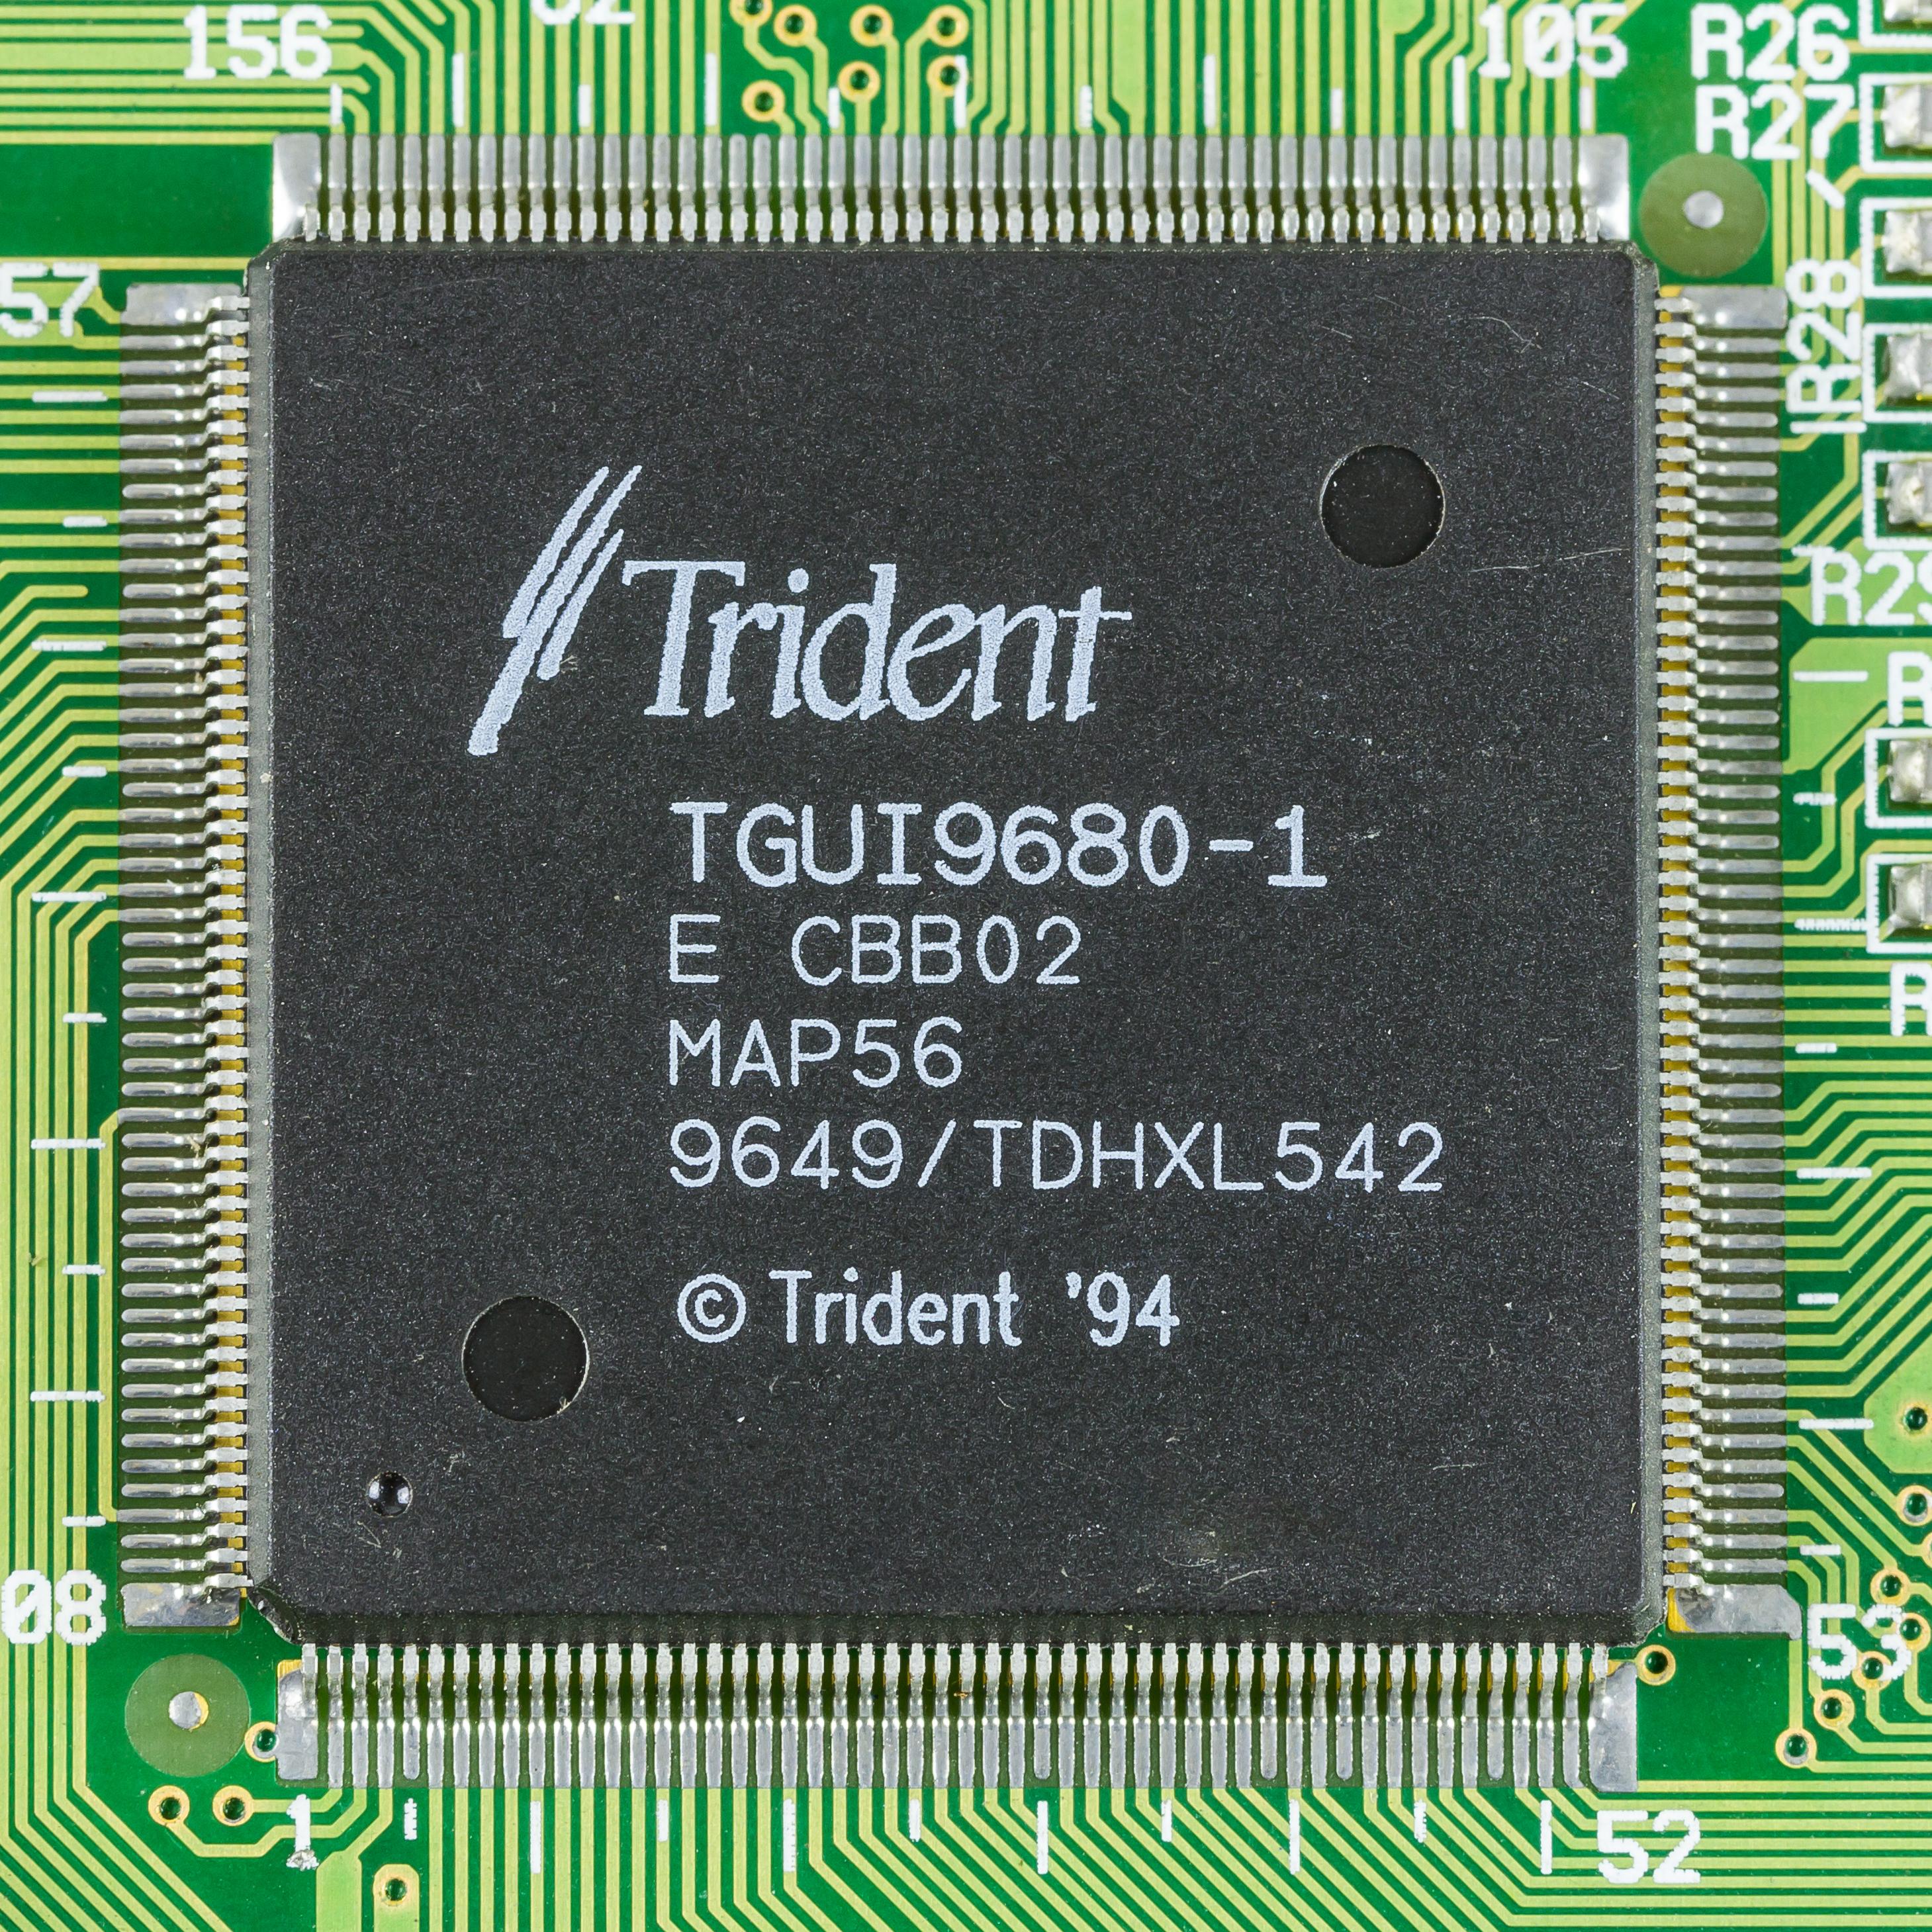 TRIDENT TGUI9680-1 DESCARGAR CONTROLADOR